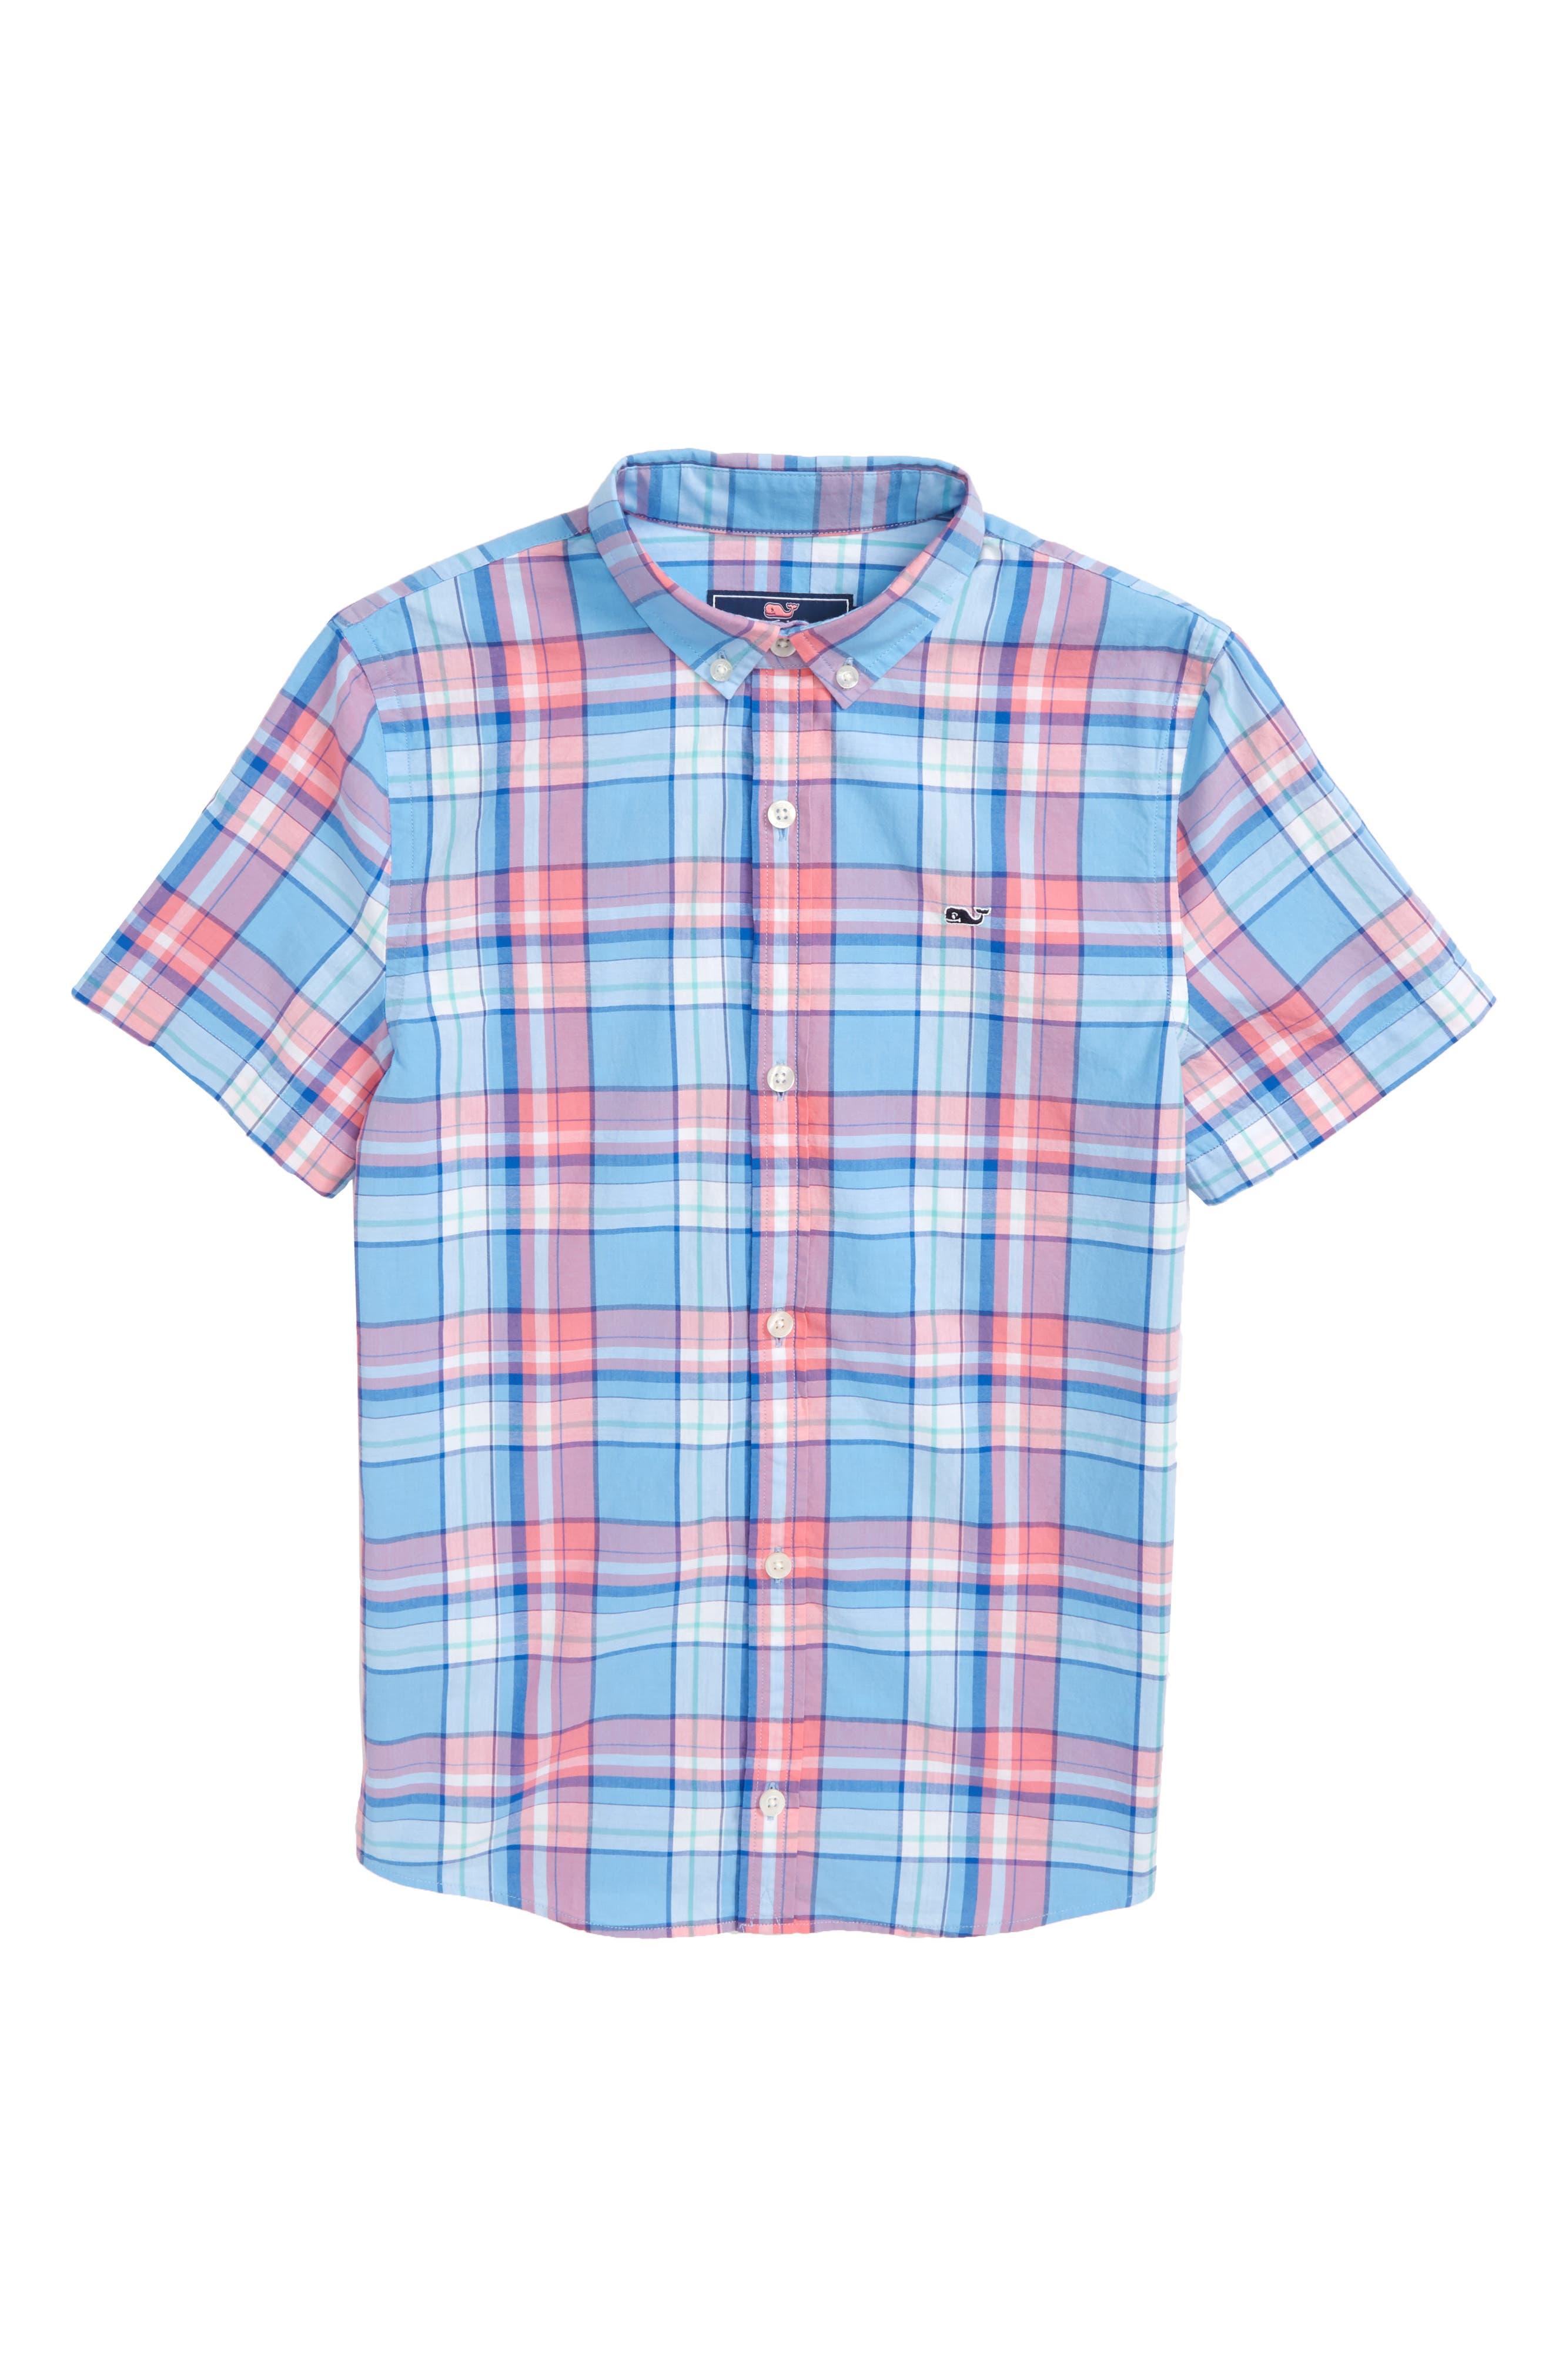 Bluff House Plaid Woven Shirt,                         Main,                         color, Ocean Breeze